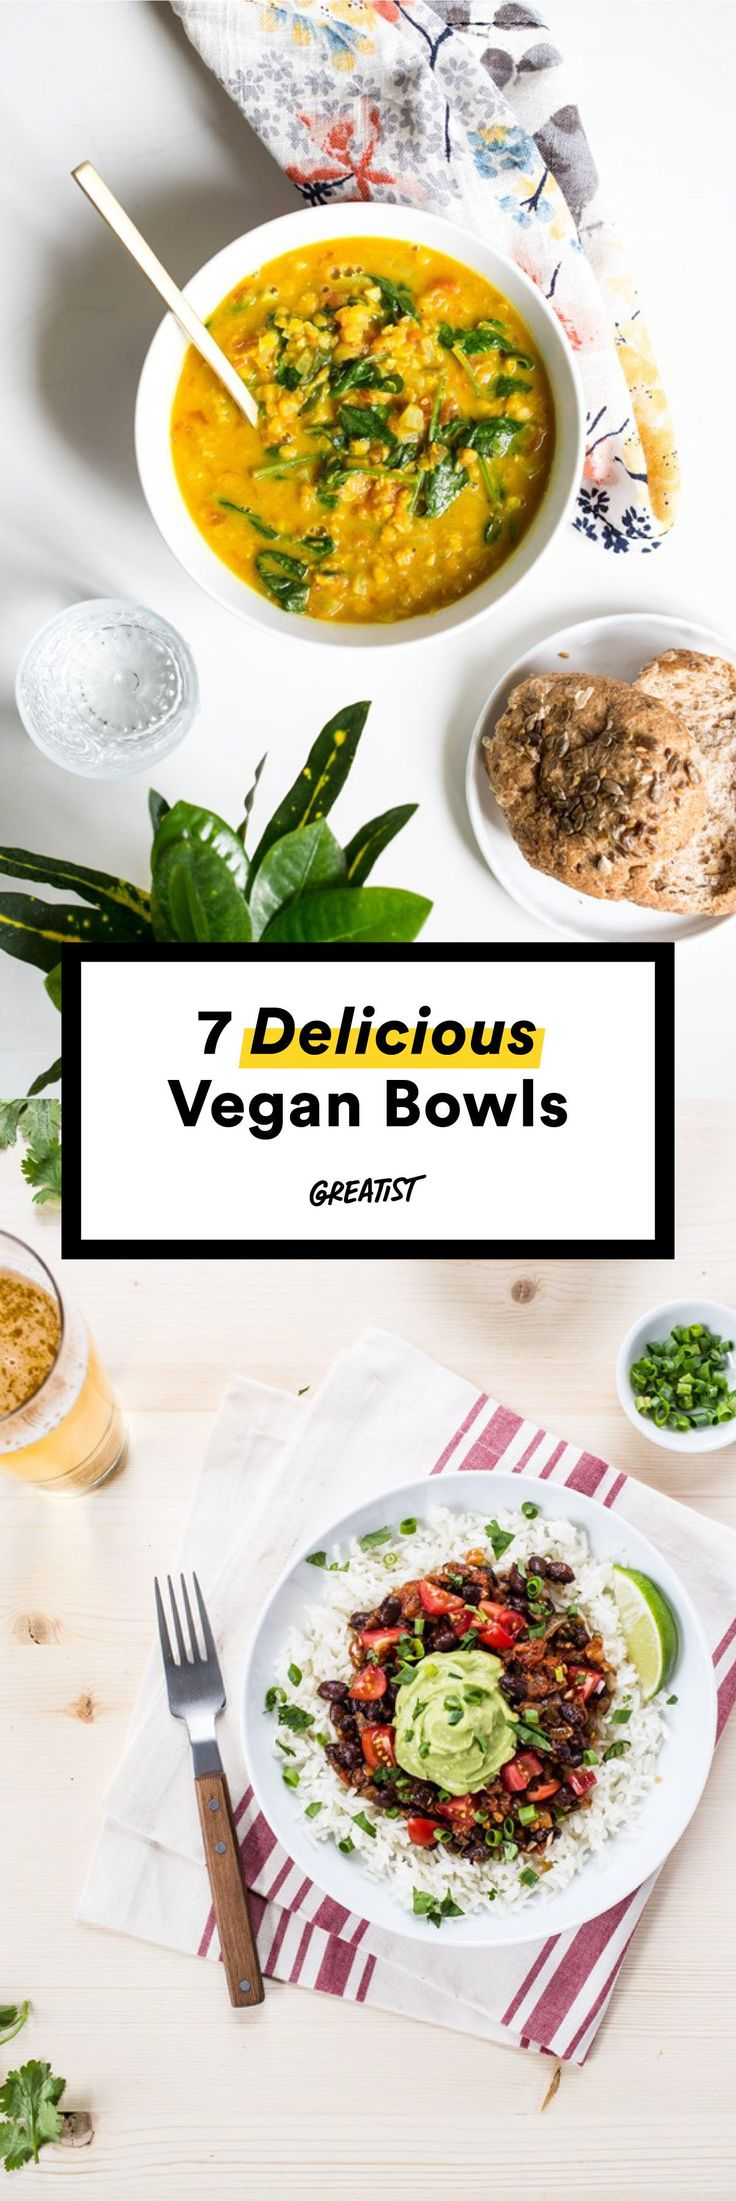 We'll meet you at the bottom. #vegan #bowl #recipe…